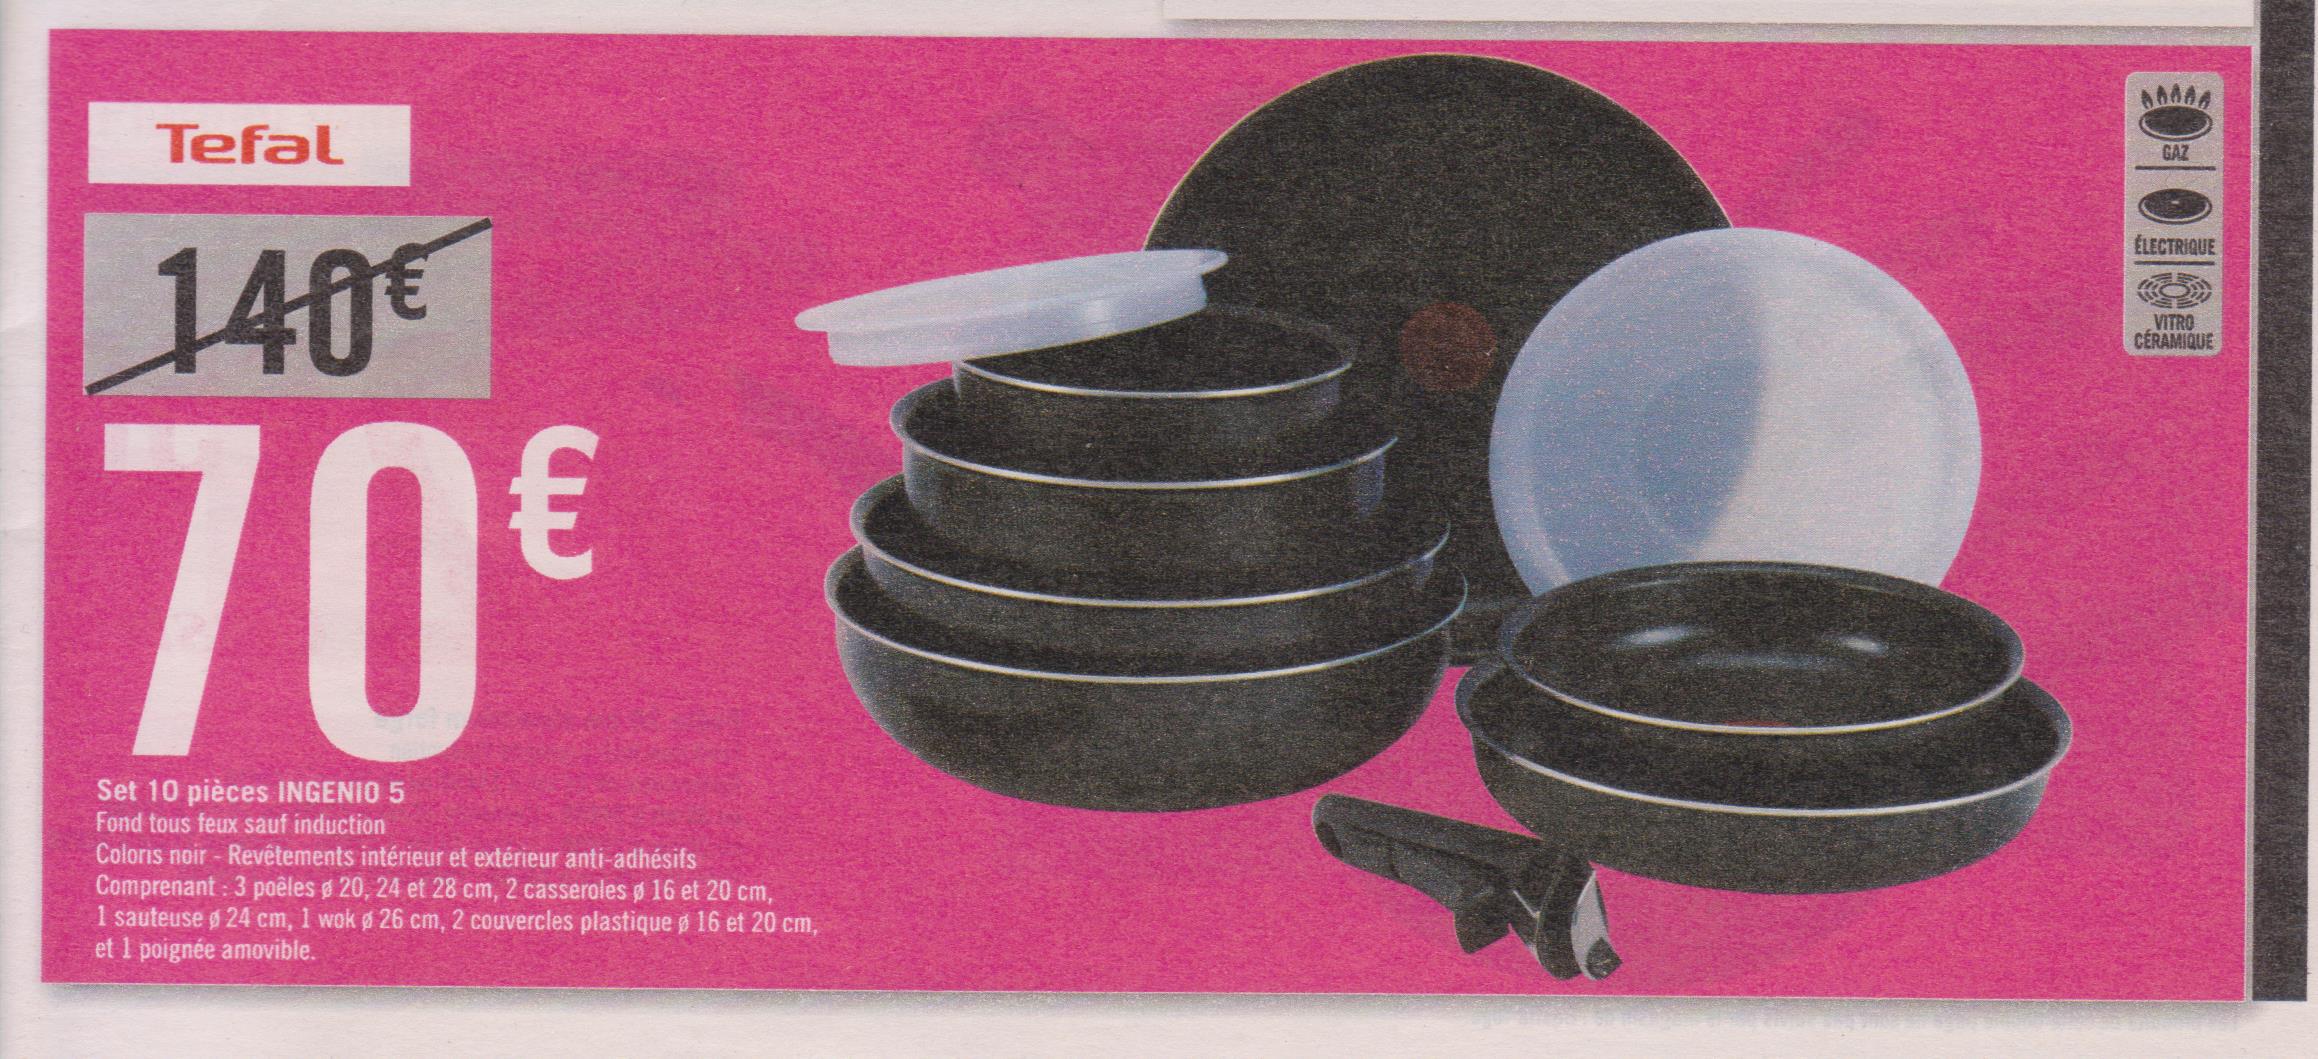 Set 10 pi ces tefal ingenio 5 - Tefal ingenio5 set 10 pieces noir ...